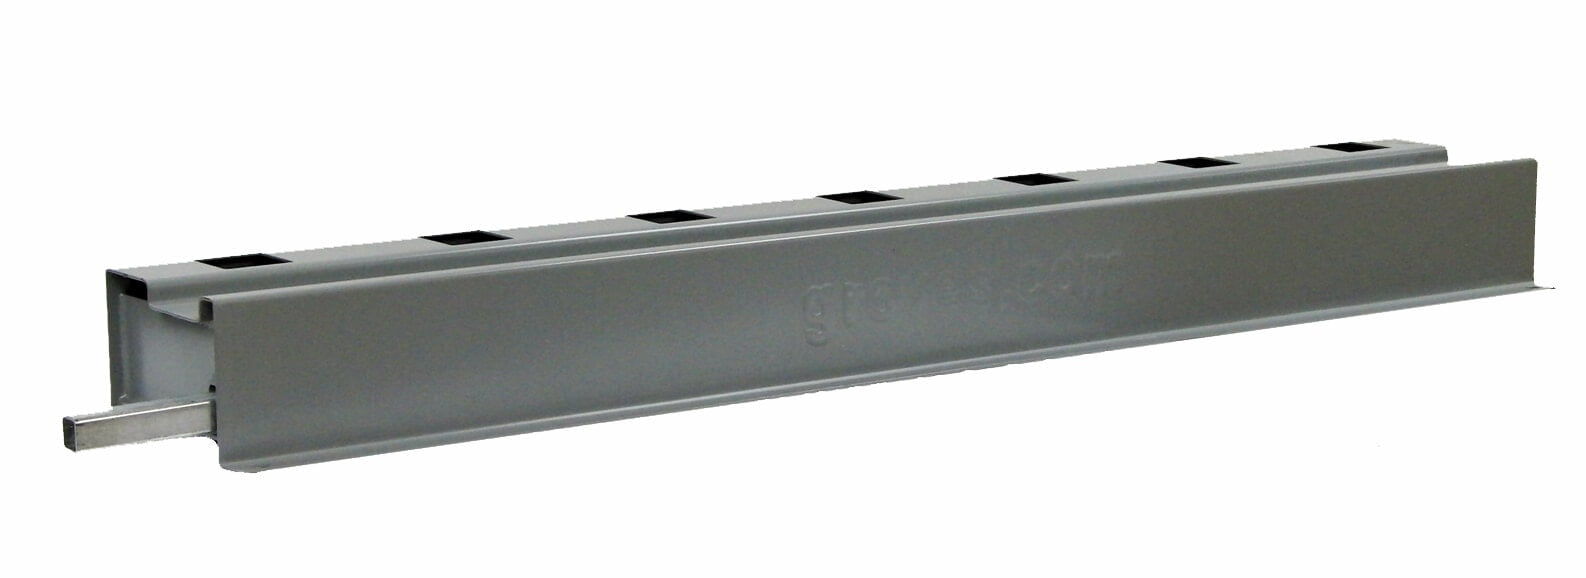 Outside Rail for 9,000 Lb. Capacity Heavy Duty Bundle Rack – BR2.5